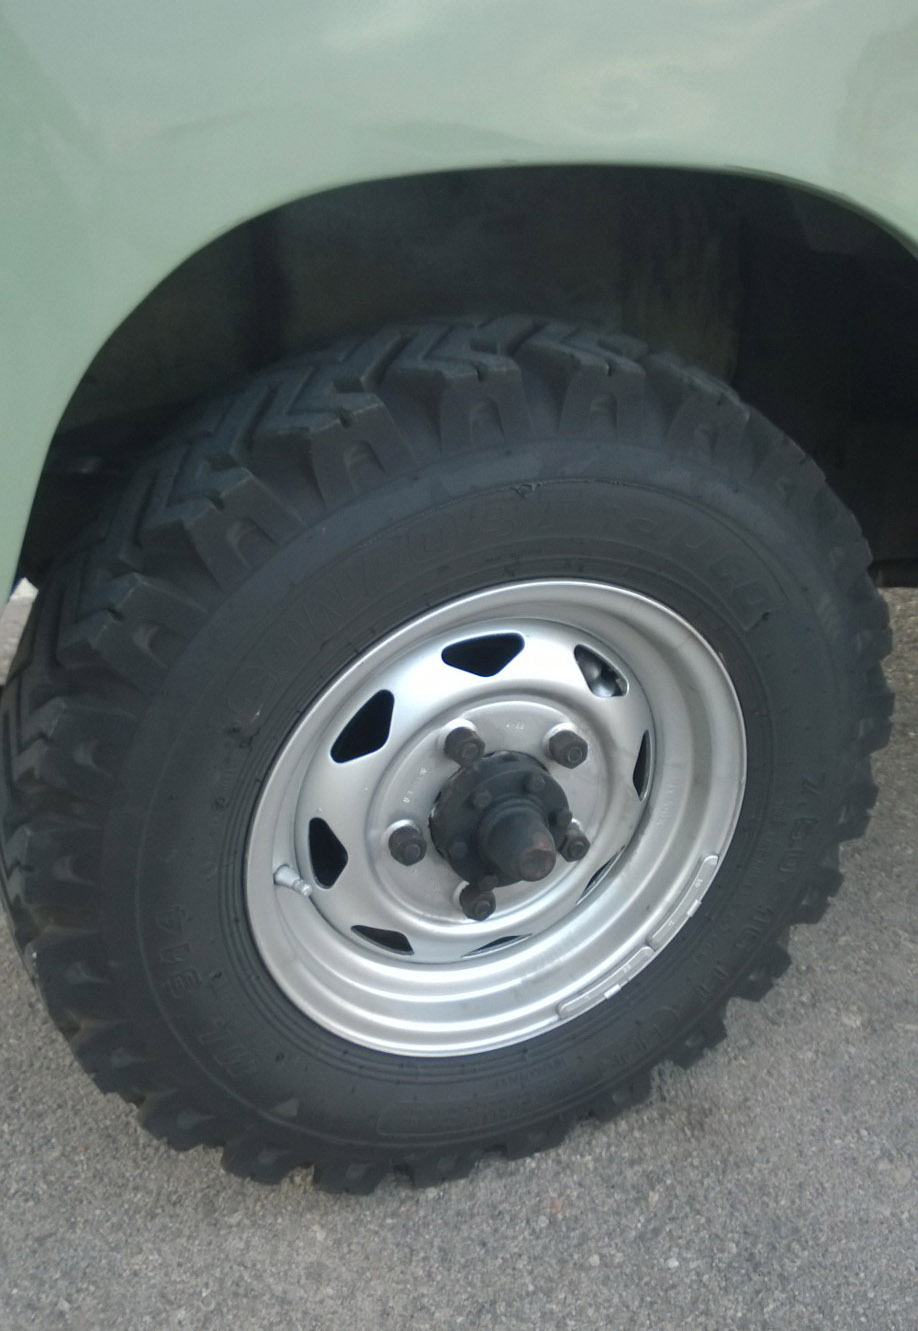 wheel_2_small.jpg